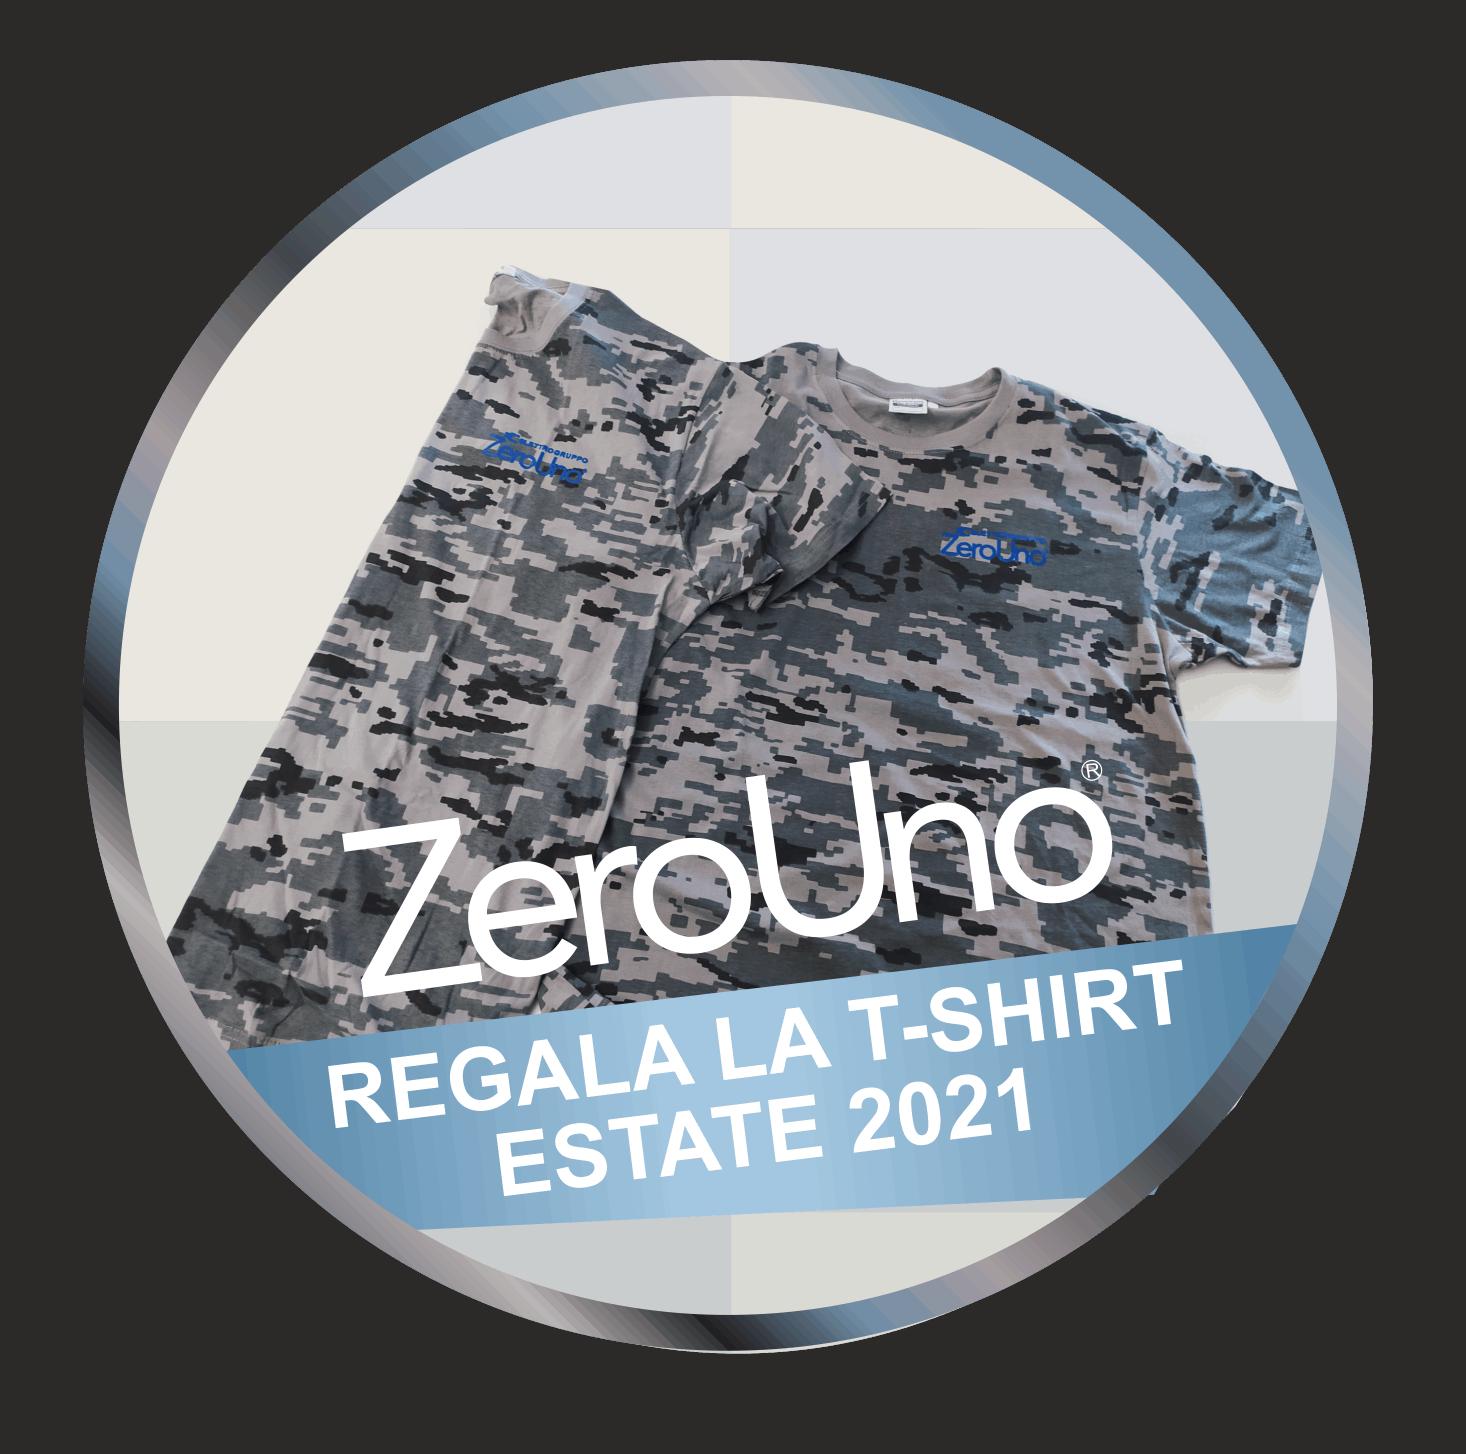 ZeroUno regala T-SHIRT Estate2021   Elettrogruppo ZeroUno   Torino   T SHIRT MAGLIETTA ZOEROUNO ESTATE 2021